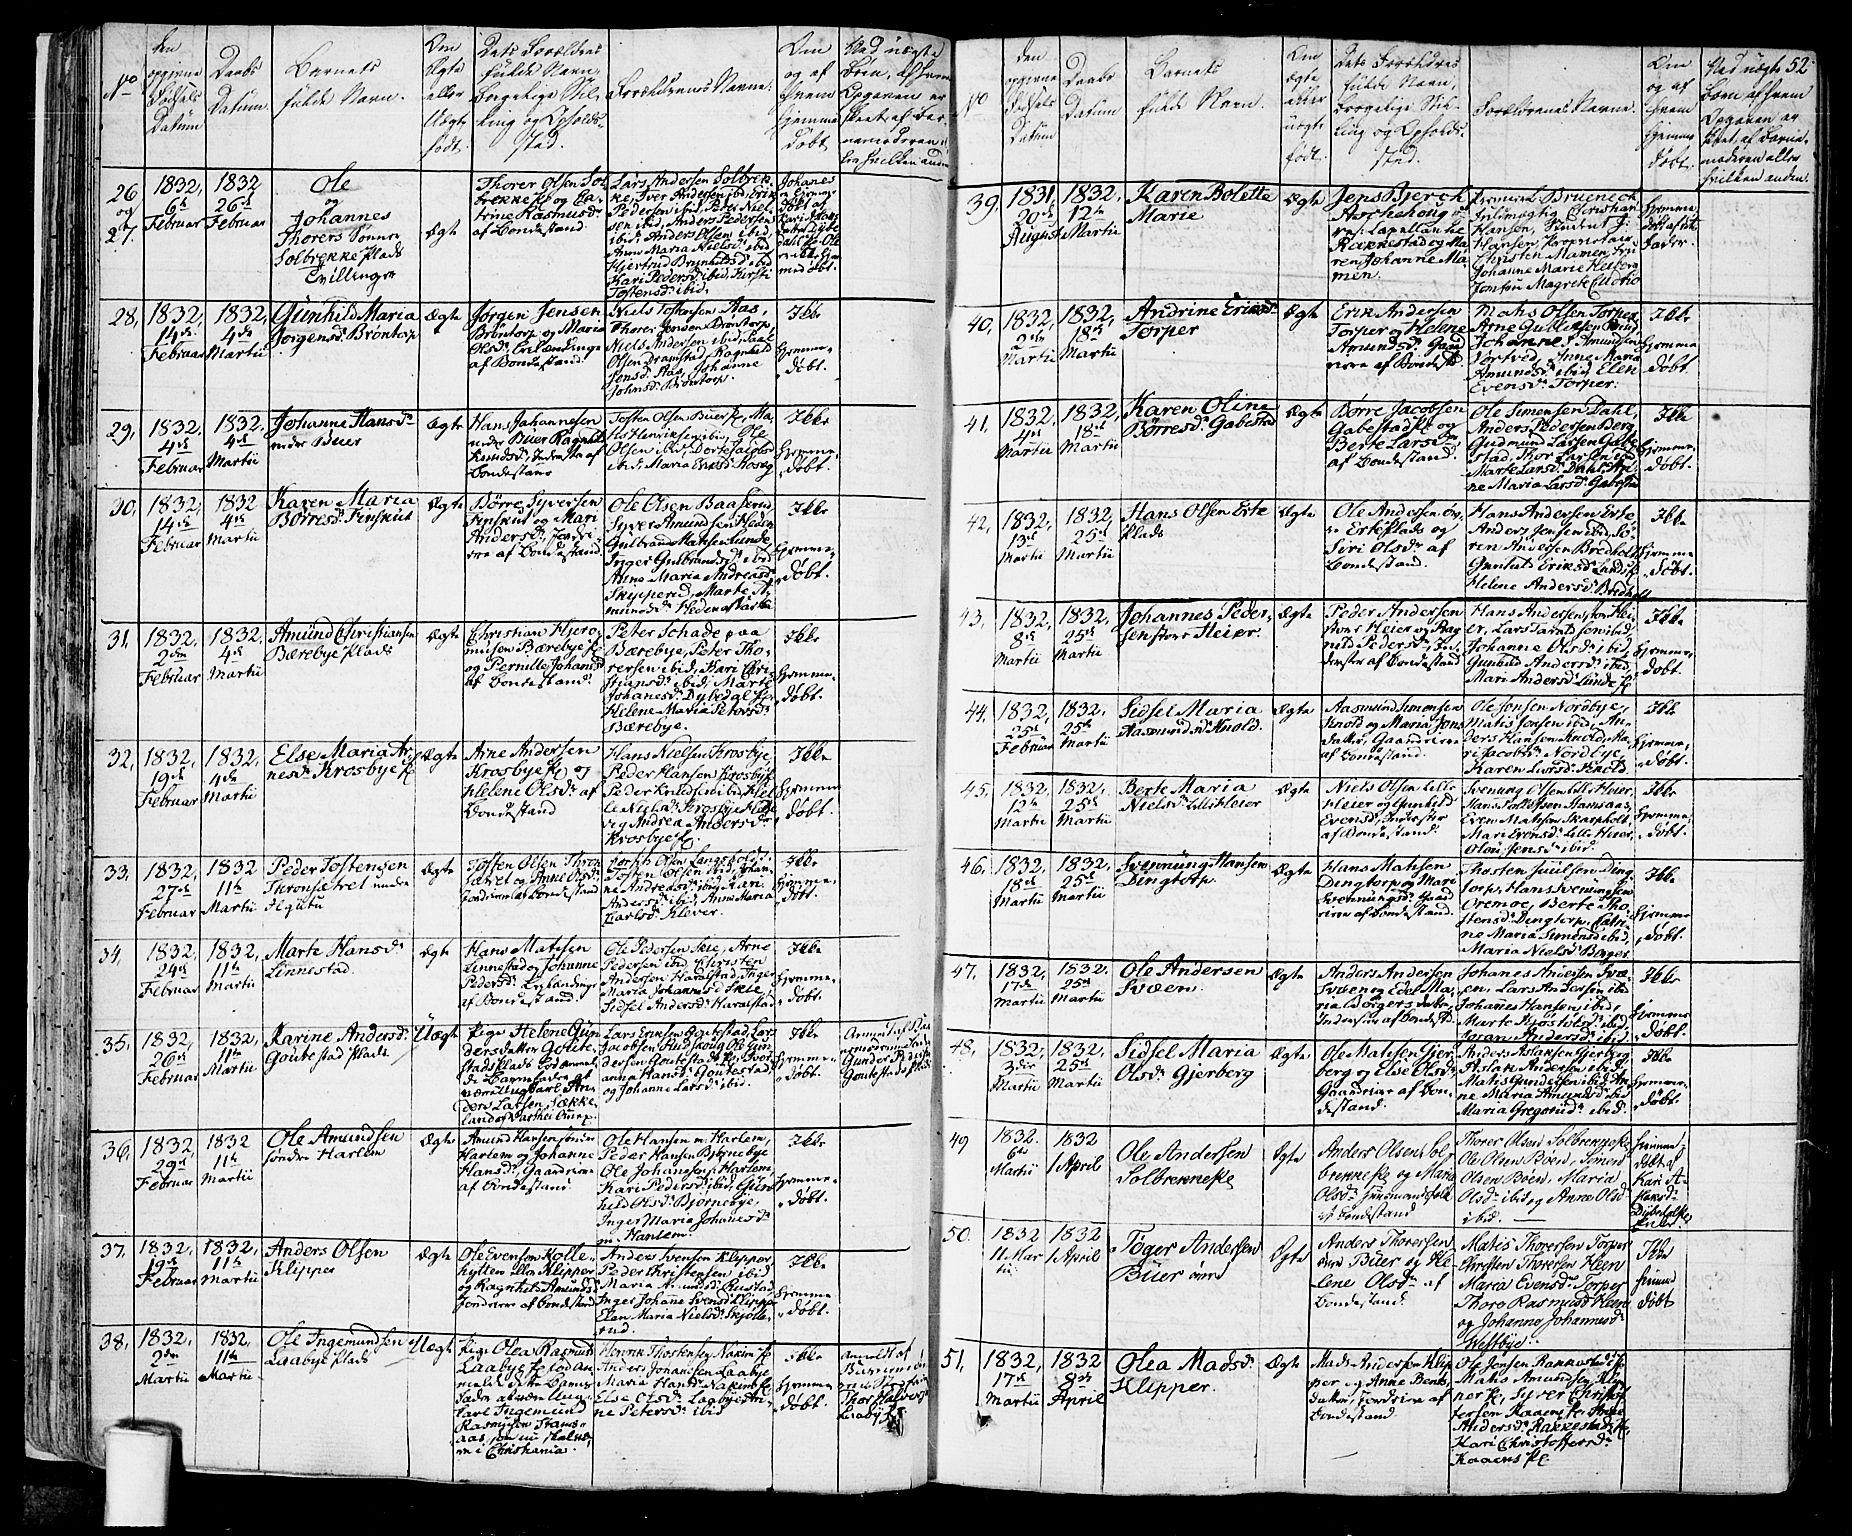 SAO, Rakkestad prestekontor Kirkebøker, F/Fa/L0007: Ministerialbok nr. I 7, 1825-1841, s. 52